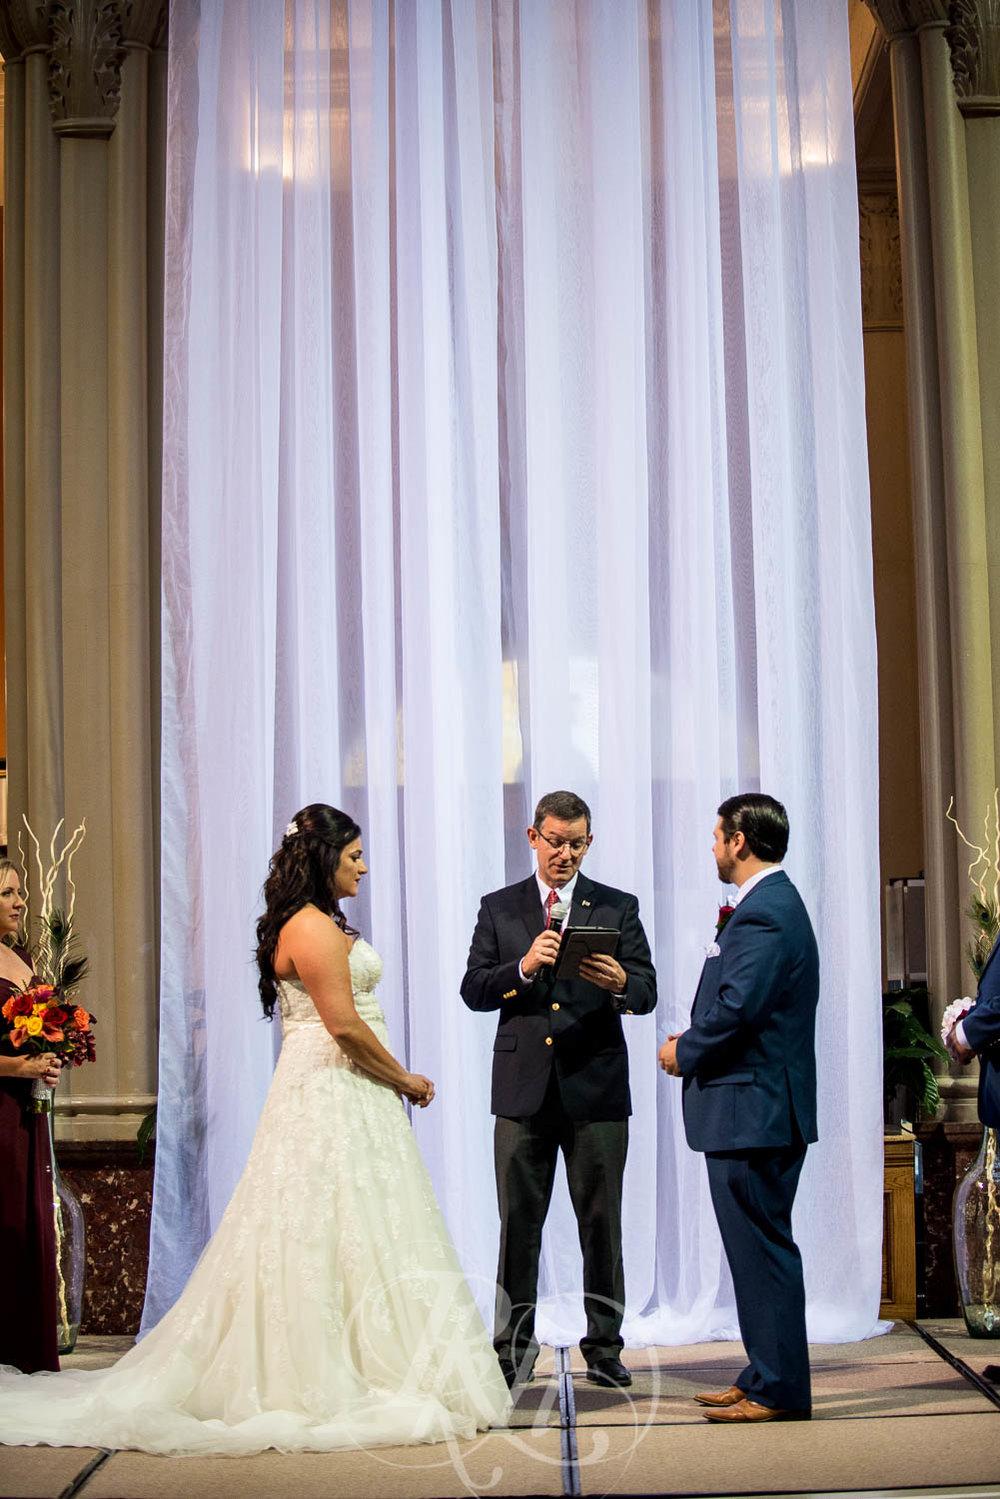 Elizabeth & David - Minnesota Wedding Photography - Landmark Center - RKH Images - Blog  (34 of 52).jpg